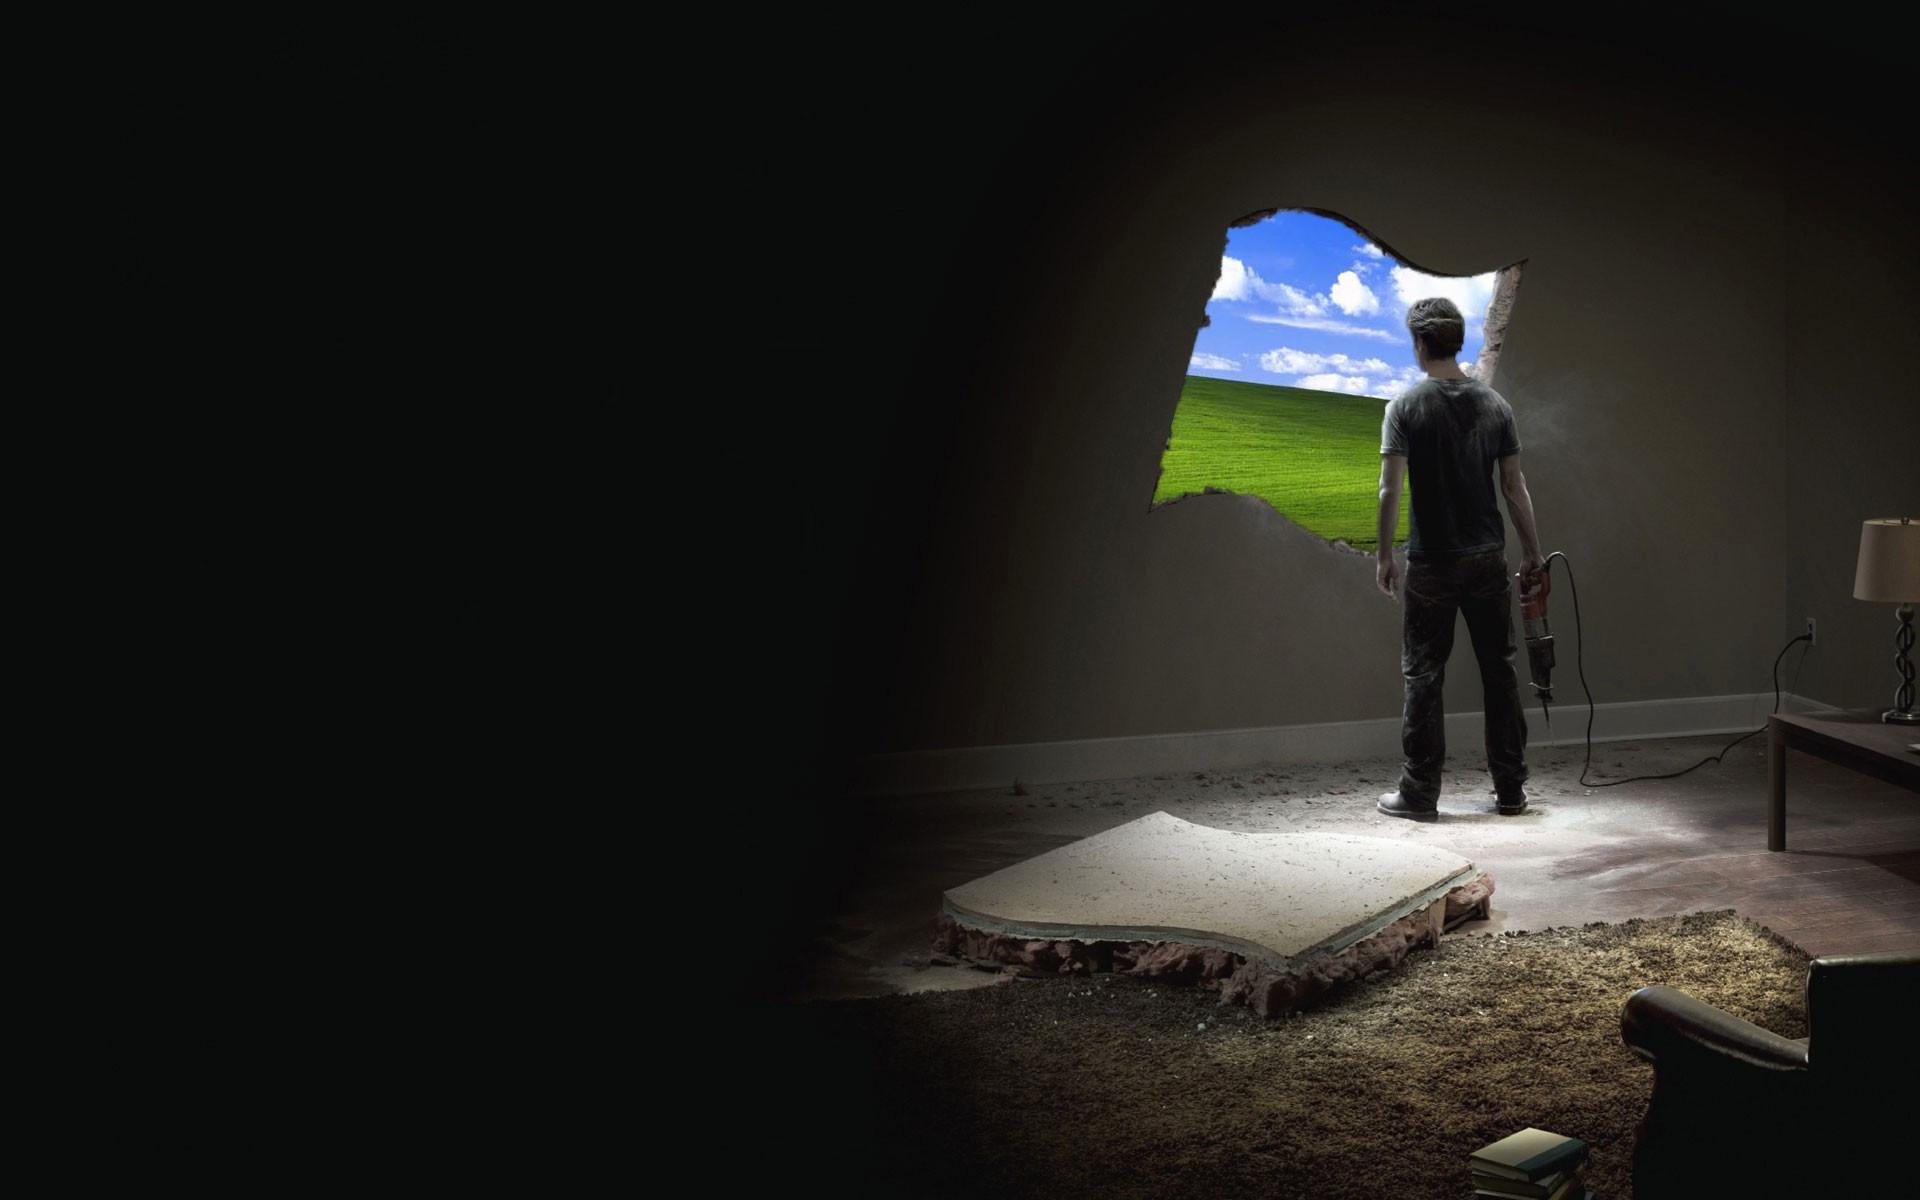 Res: 1920x1200, 0 800x600 Windows XP Desktop Backgrounds  Windows Xp Wallpaper  Awesome Waving Goodbye to Old Windows Xp